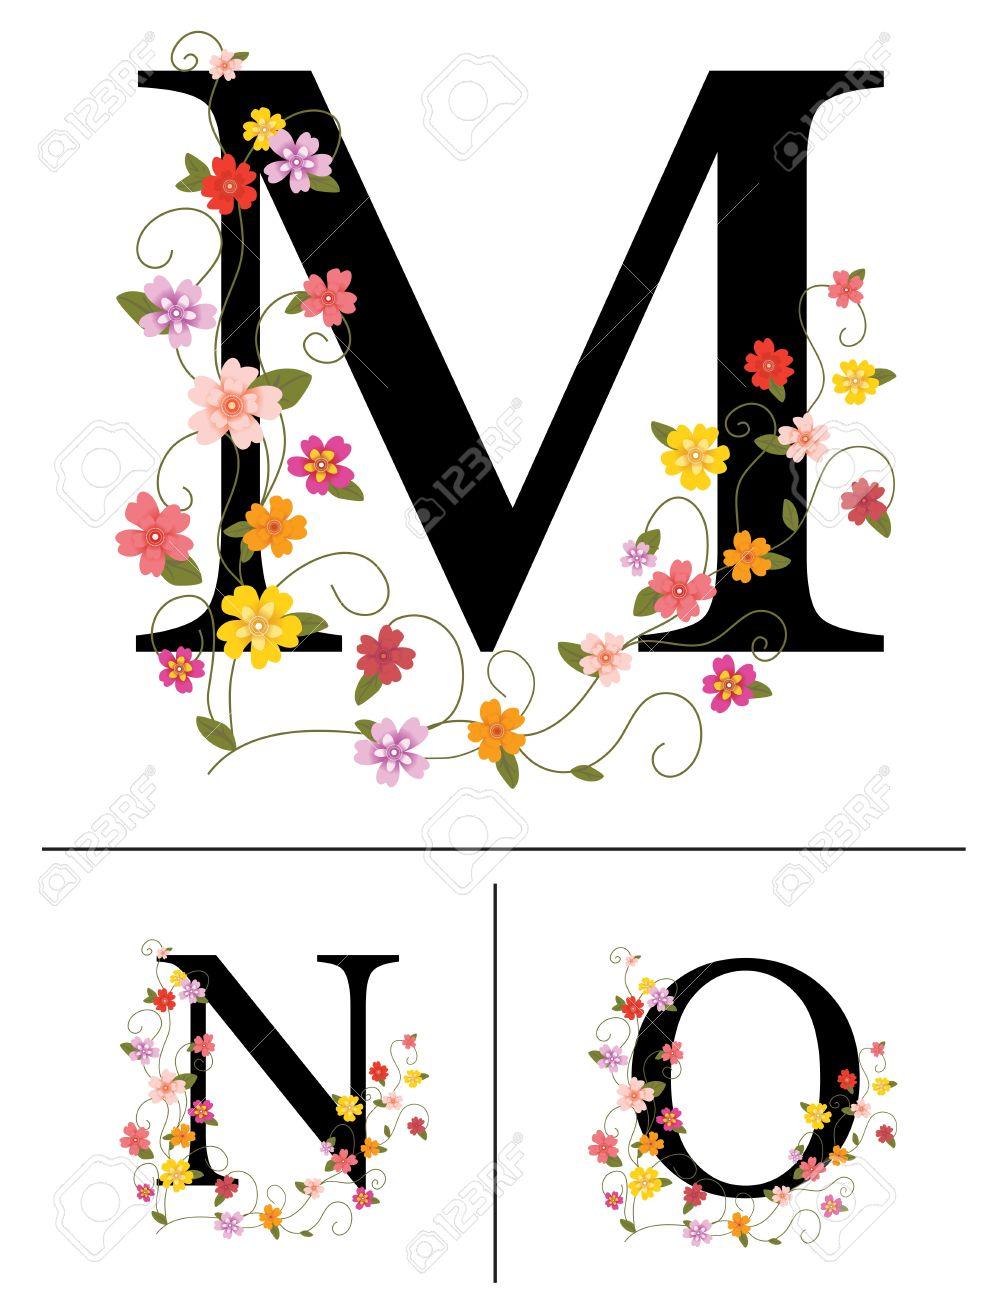 Decorative Letters Decorative Super Caps Letters M N O Royalty Free Cliparts